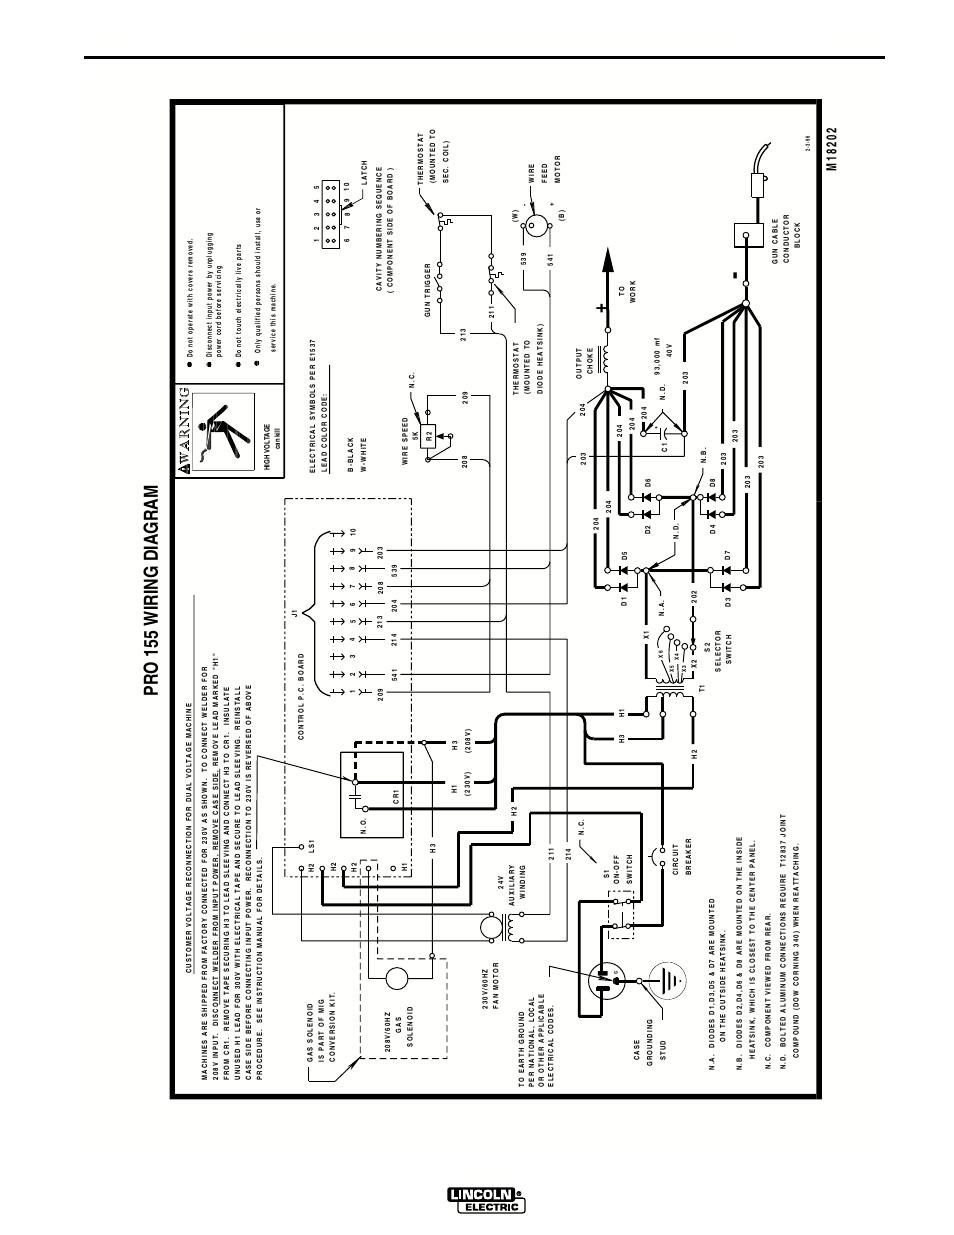 1995 lincoln continental engine diagram